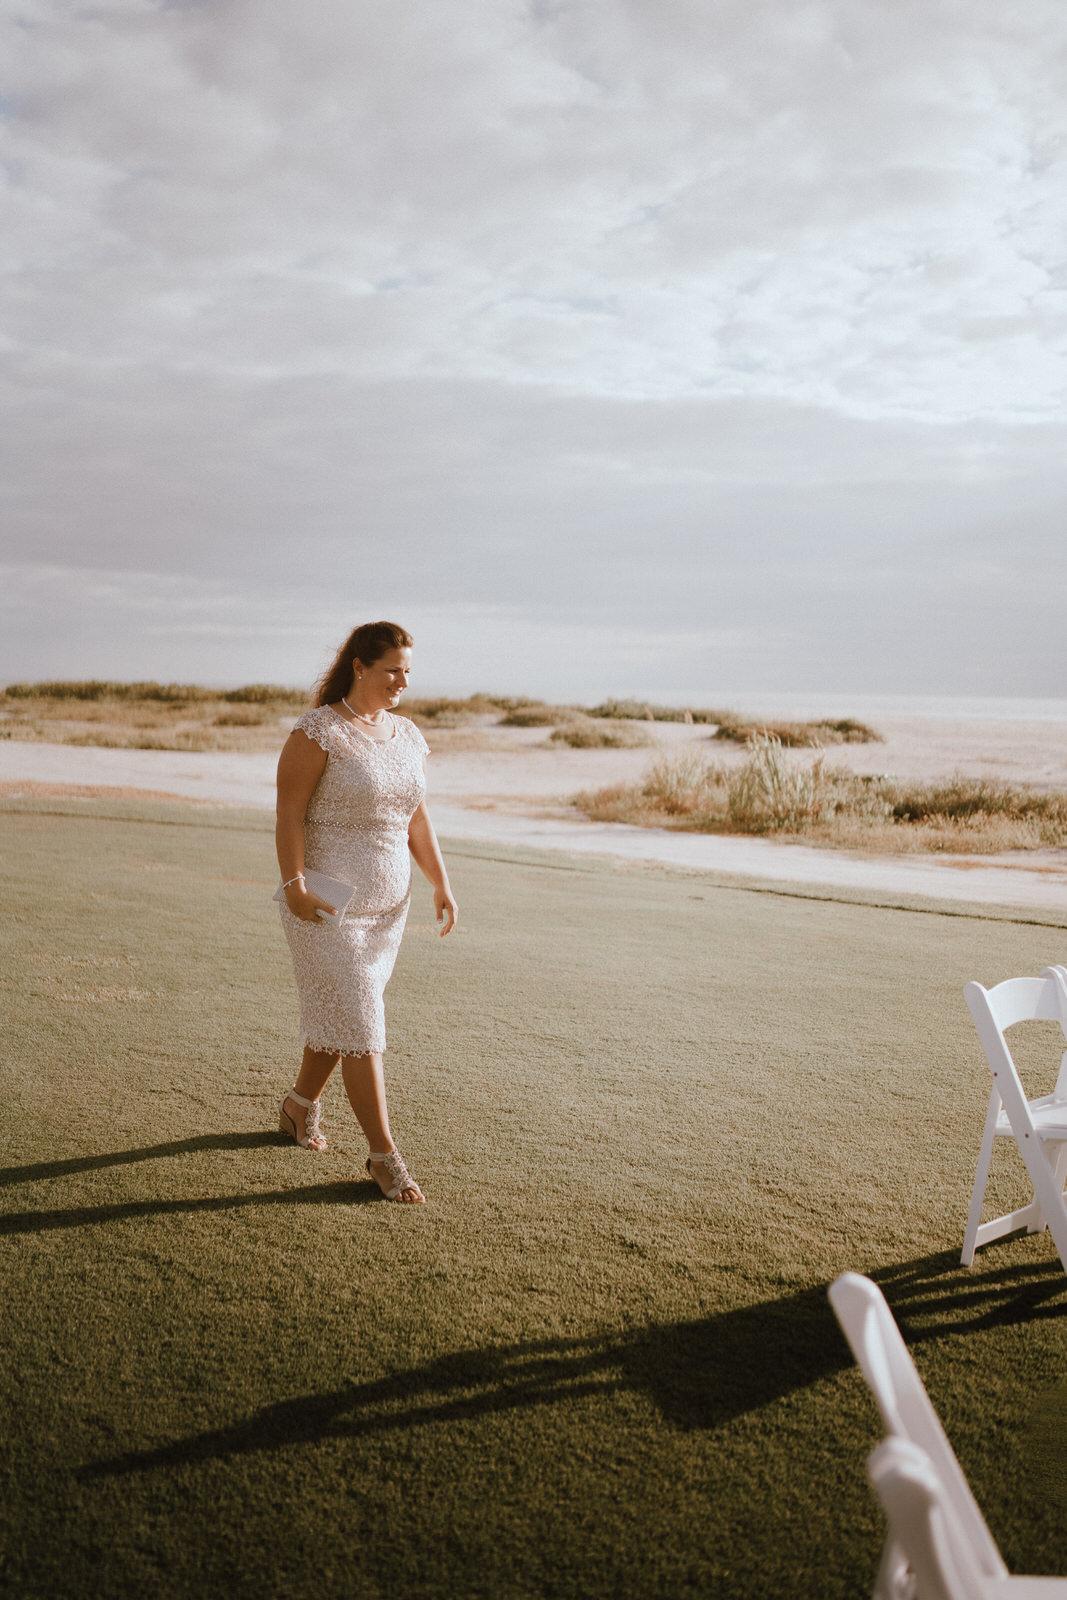 South Seas Island Resort Elopement- Alyana and Shawn- Michelle Gonzalez Photography-415.JPG